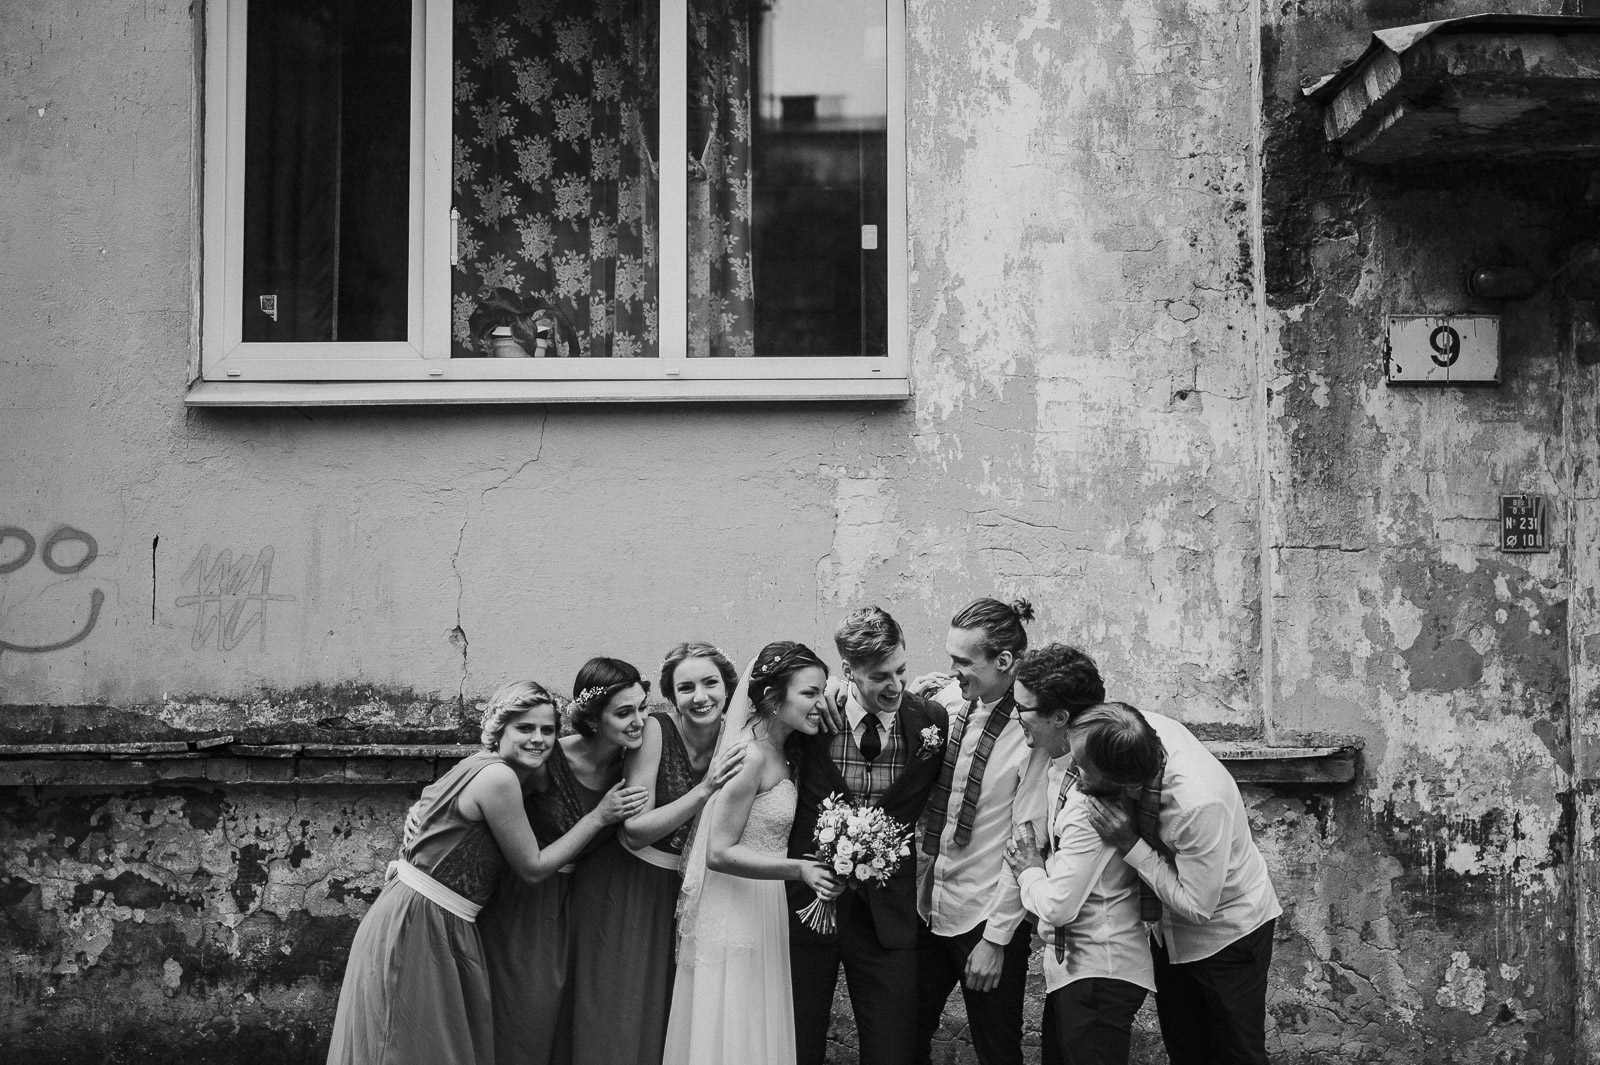 Valdur_Rosenvald_Johanna_pulmafotograaf_Mait_Juriado_M&J_Studios-026